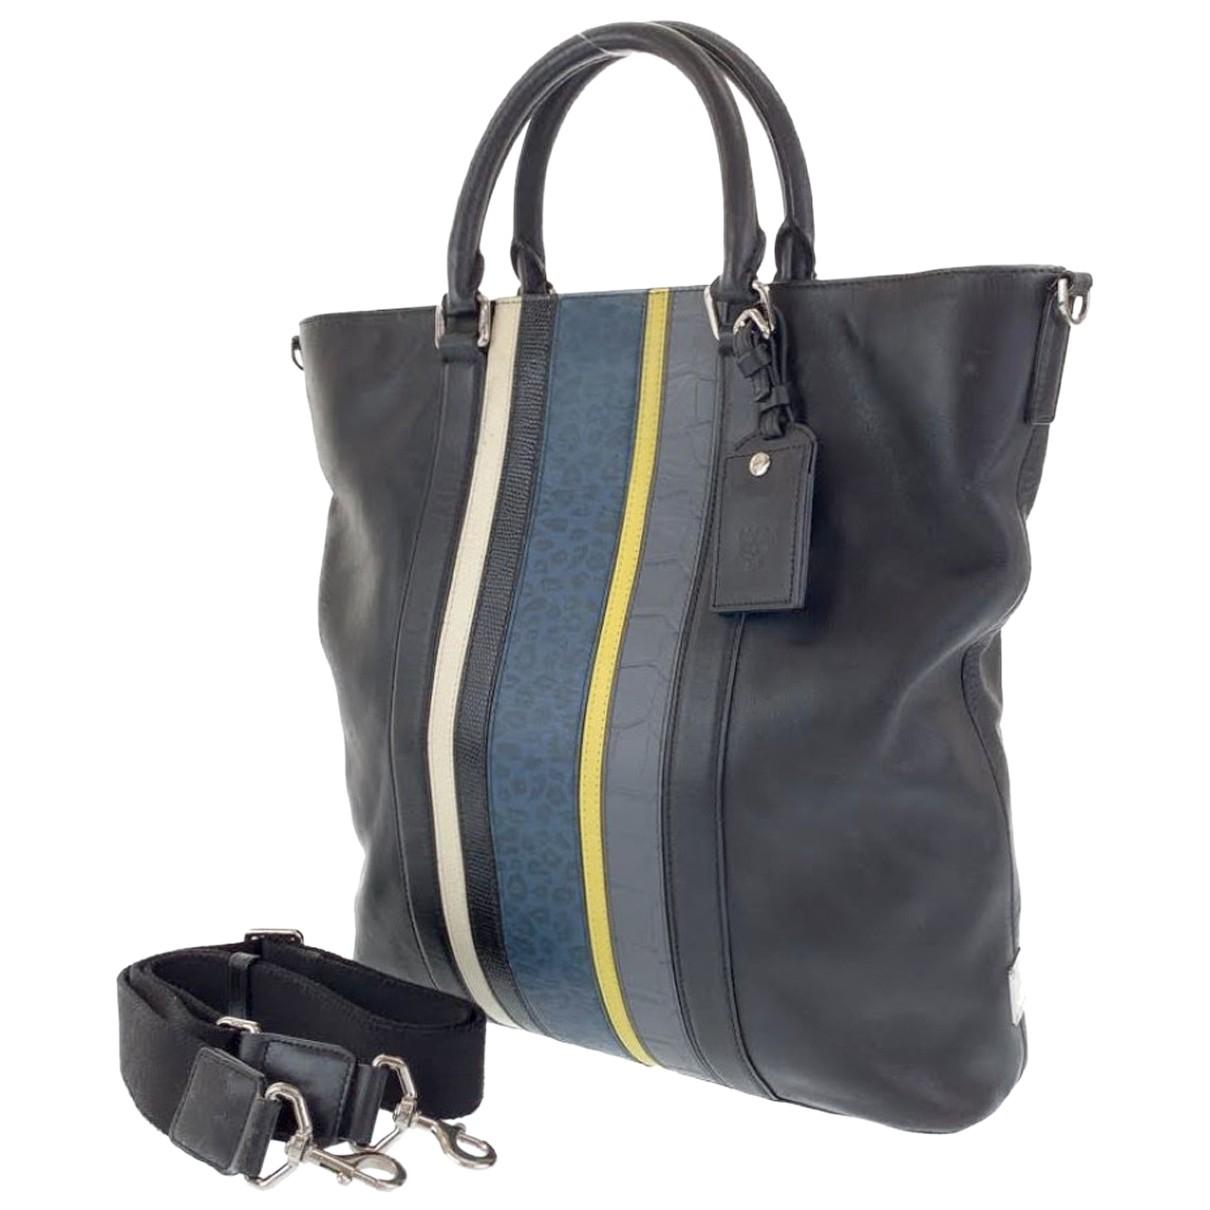 Mcm N Leather bag for Men N